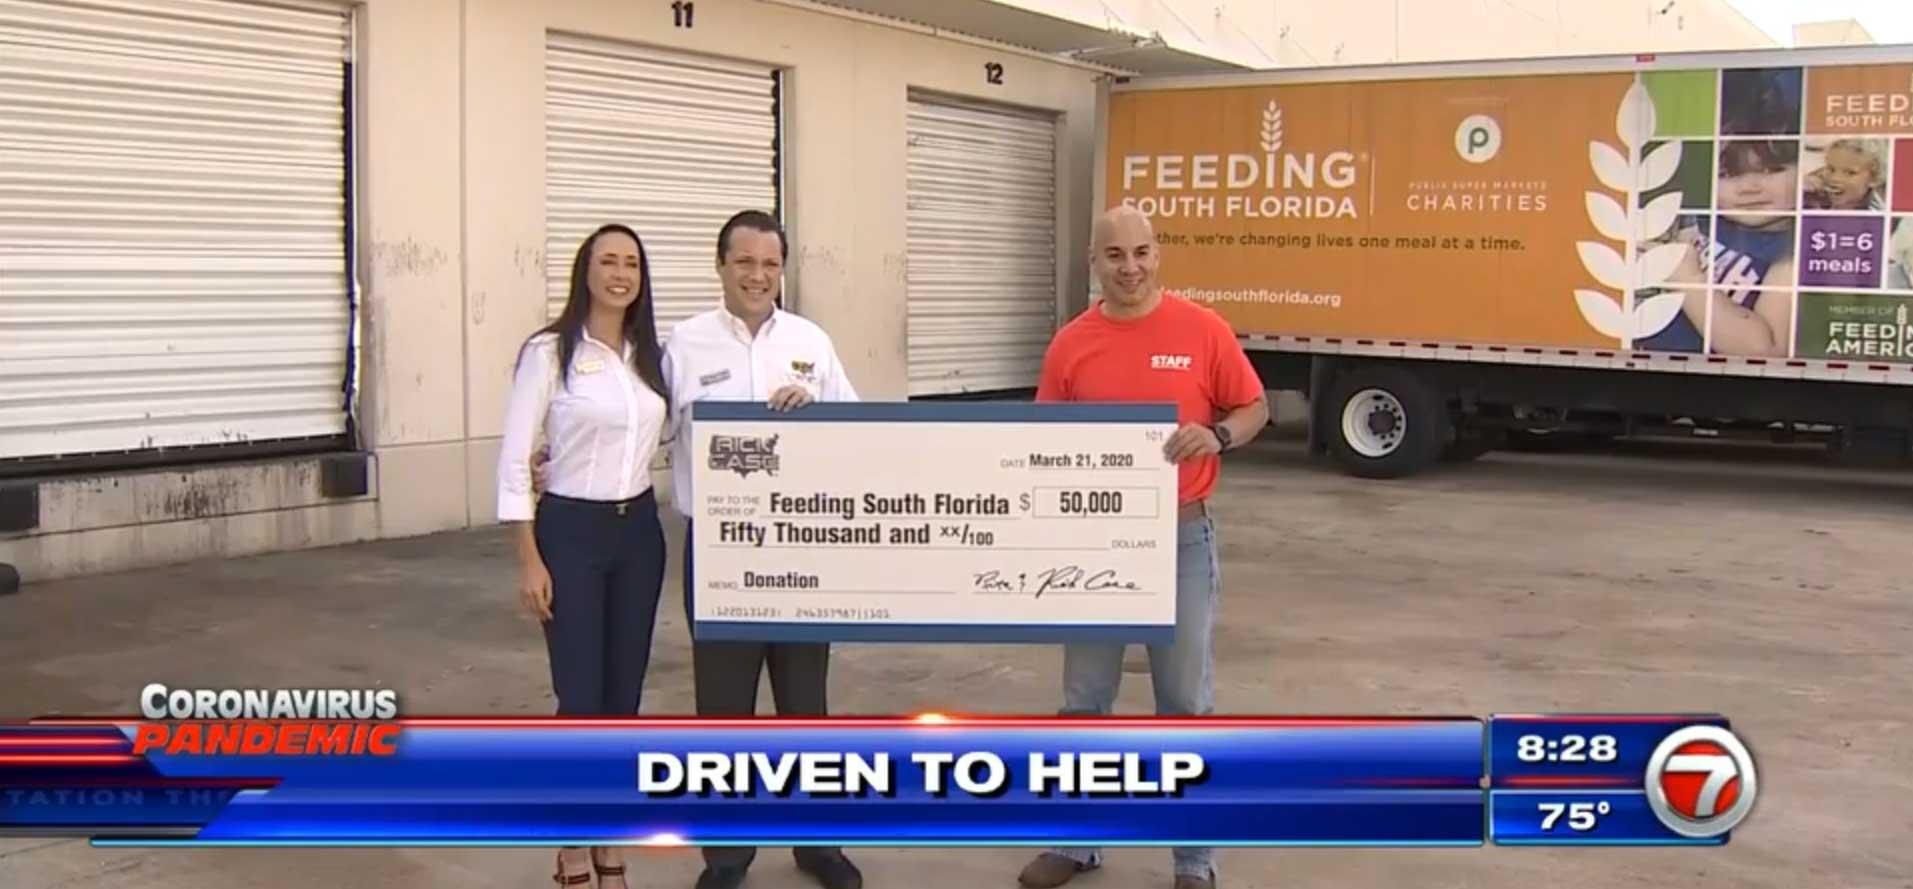 Rick Case Automotive Group donates $50K to Feeding South Florida